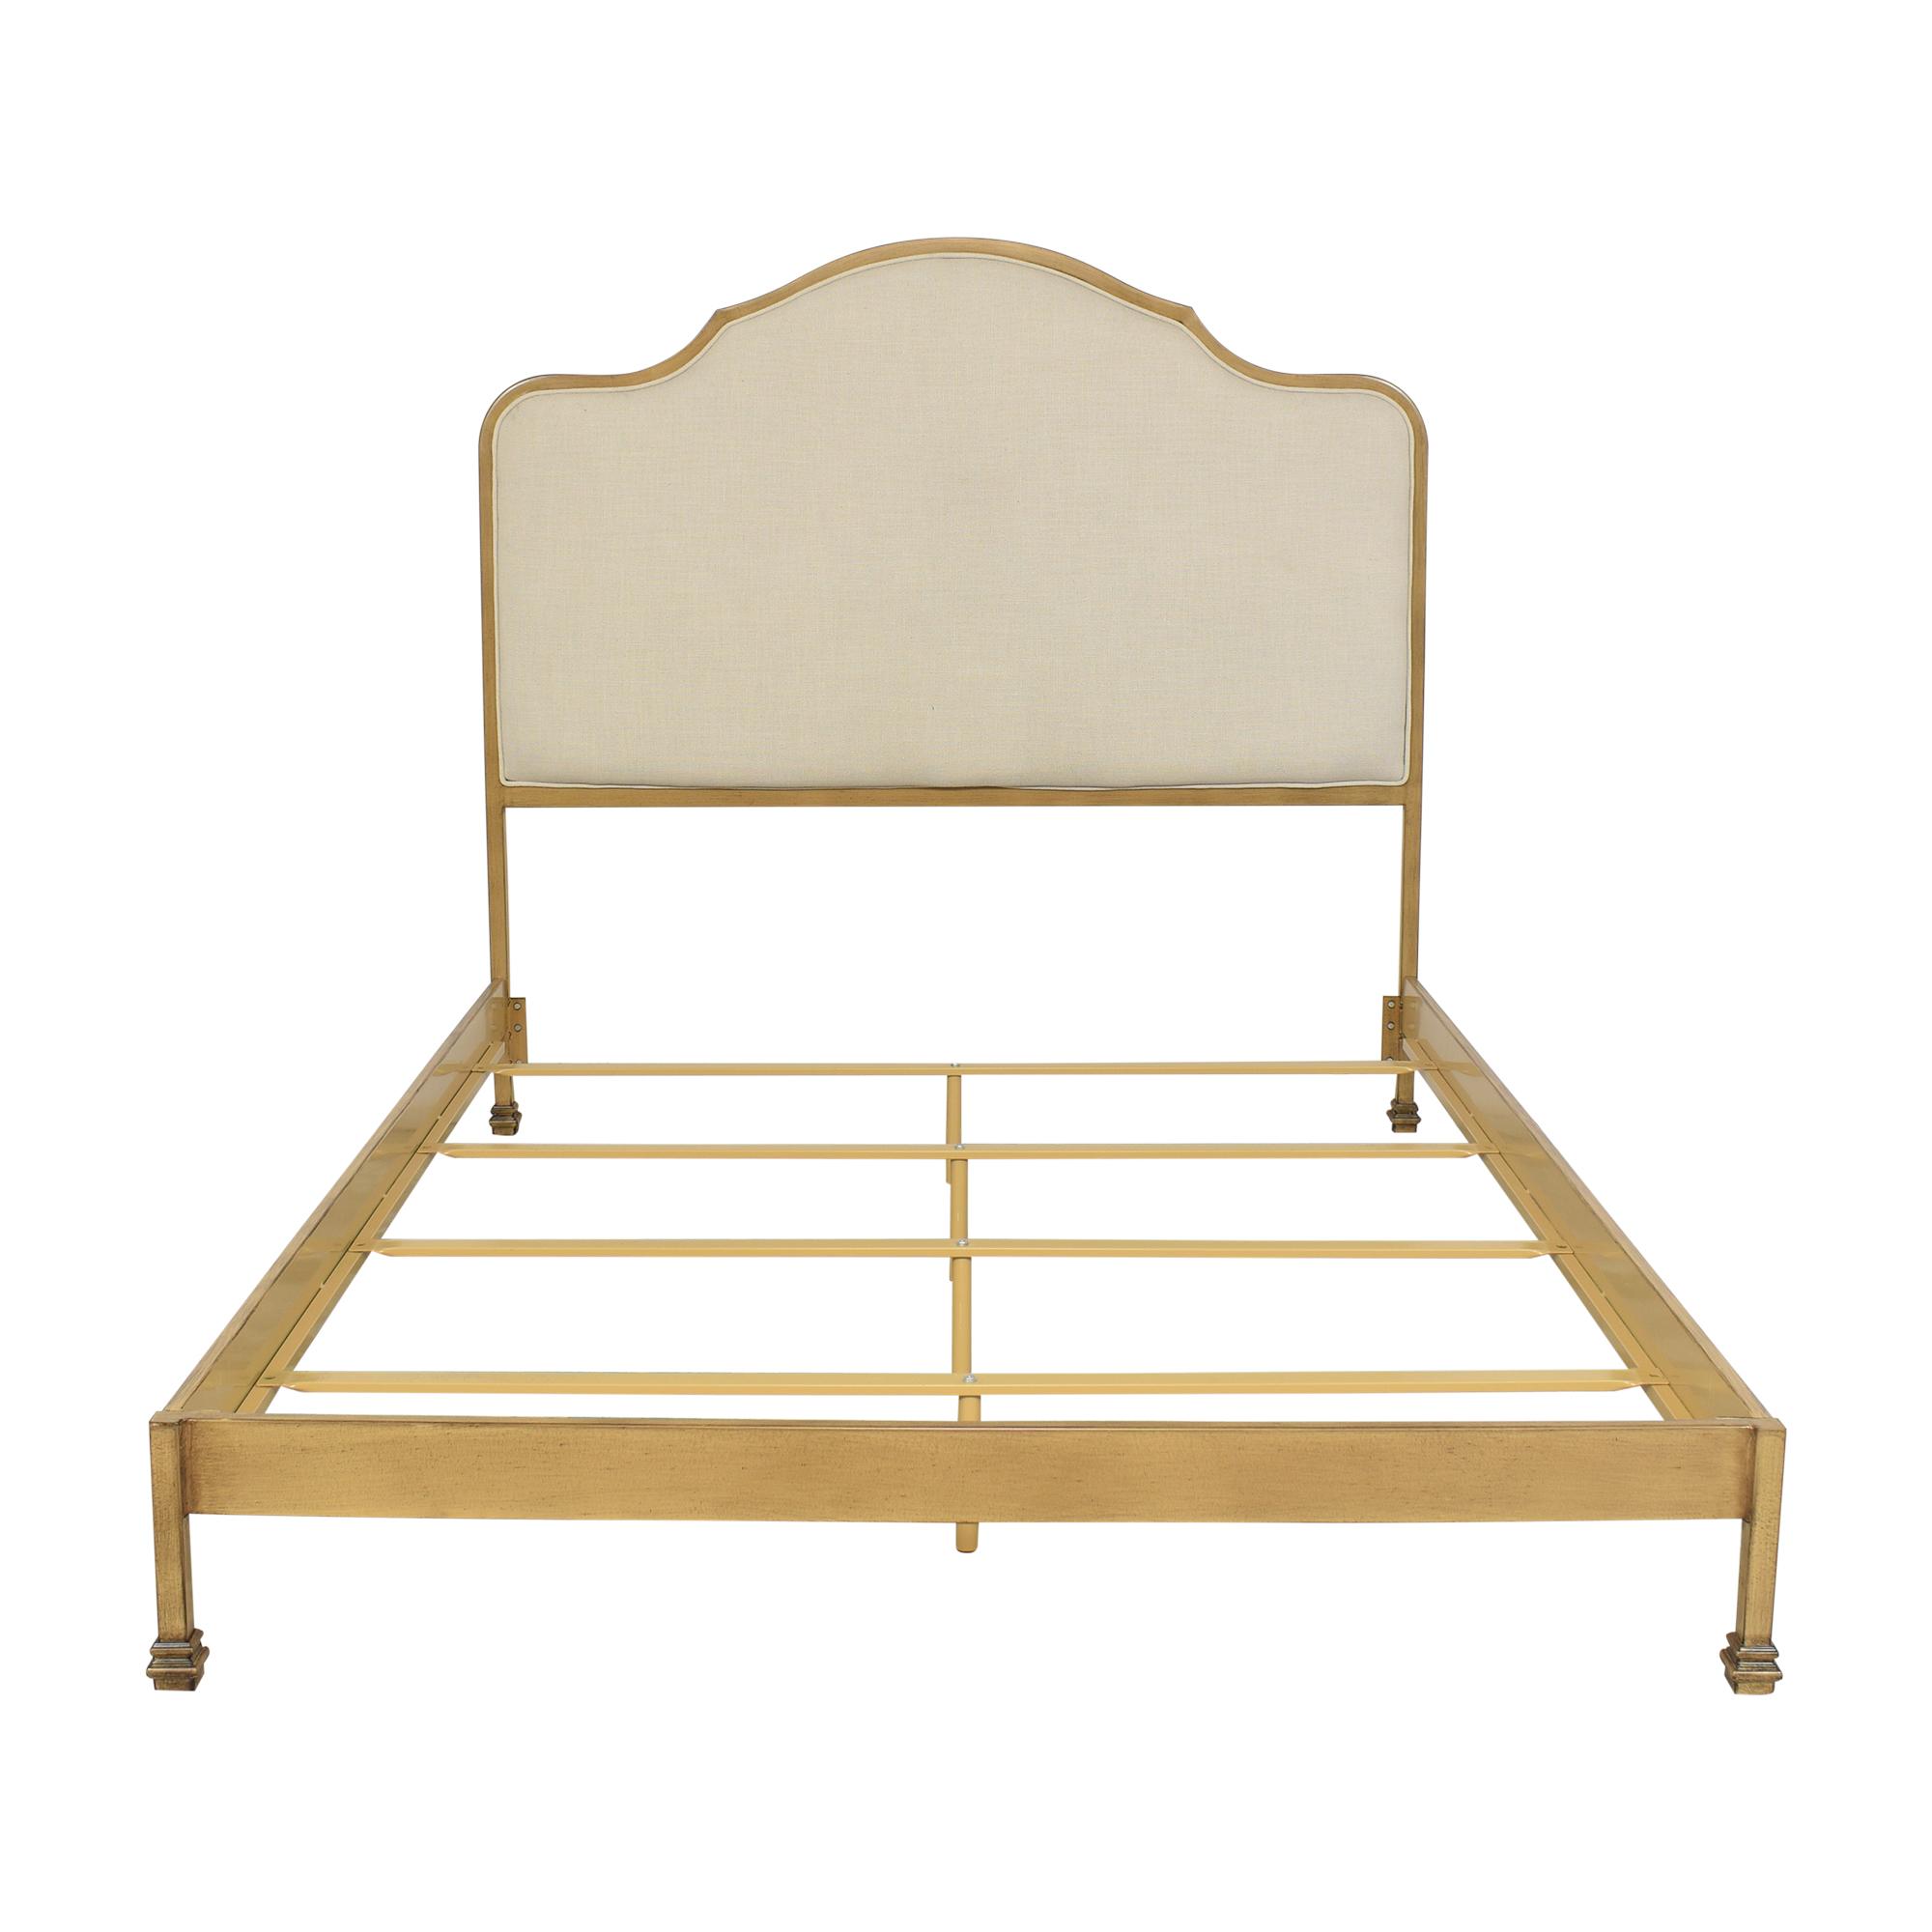 Leggett & Platt Leggett & Platt Calvados Queen Panel Bed for sale